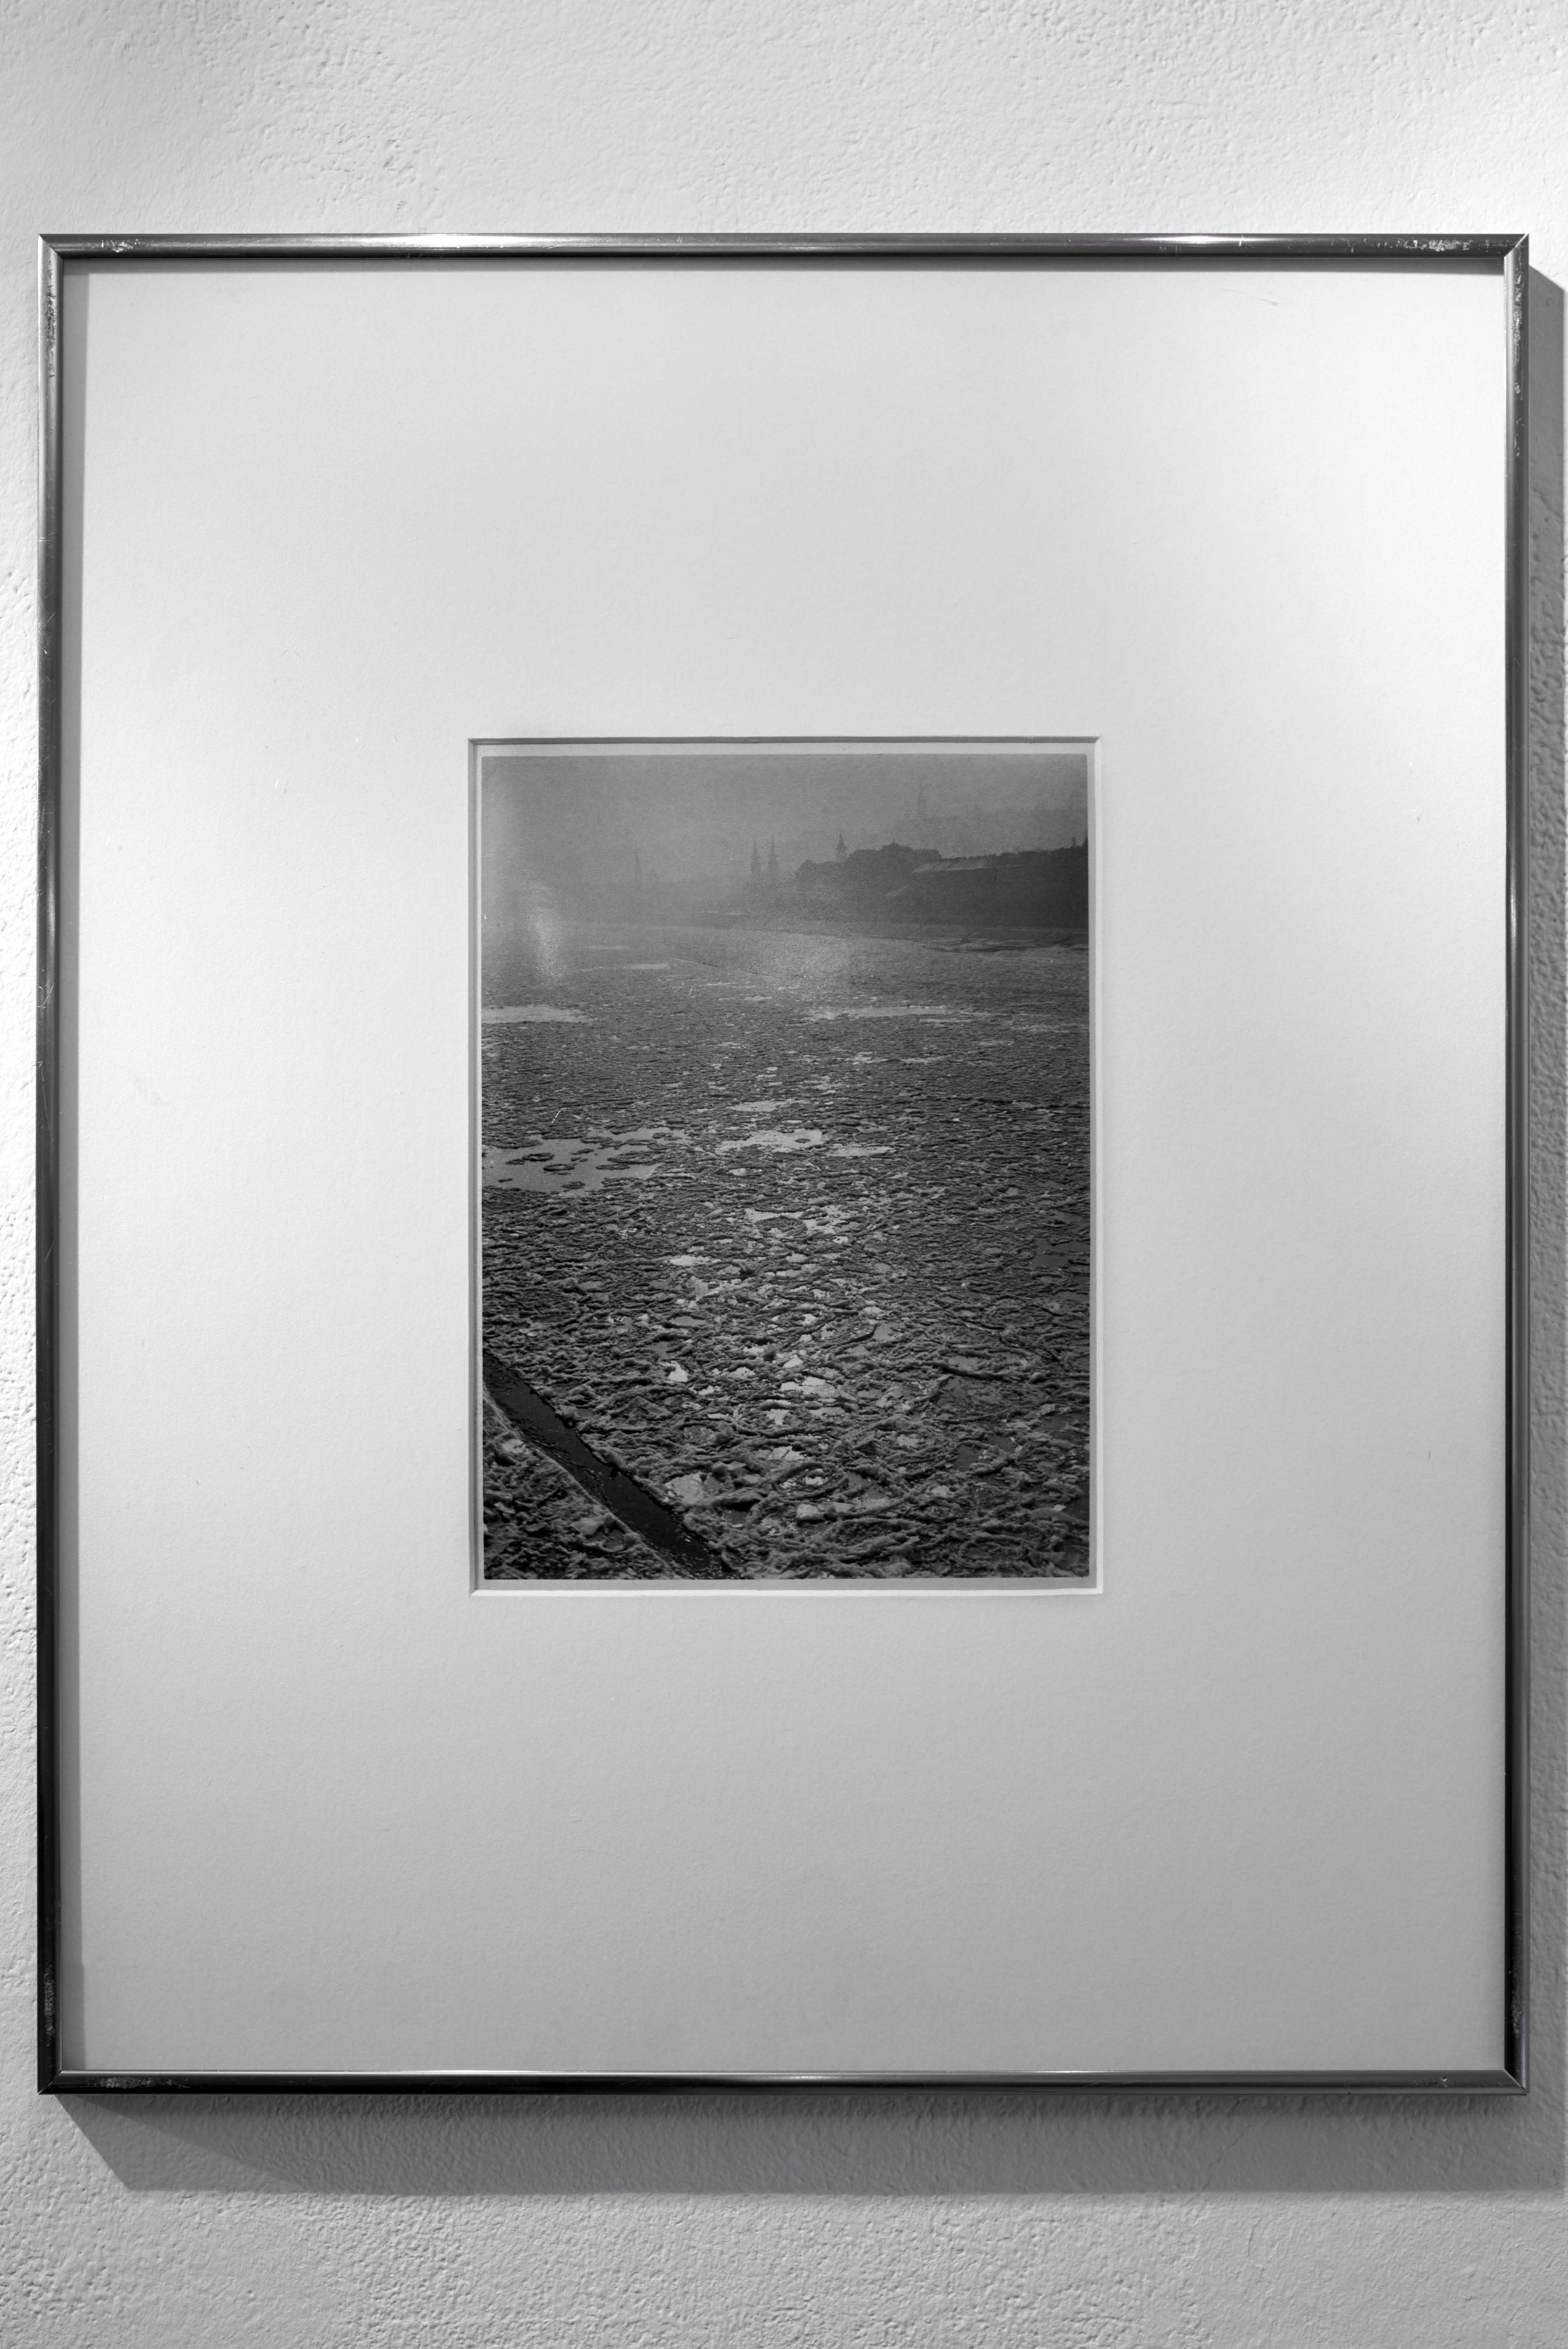 Hevesy Iván: A zajló Duna, Budapest, 1932. k. / Icy Danube river, Budapest, c. 1932. <br />Fotó: Kiss Imre